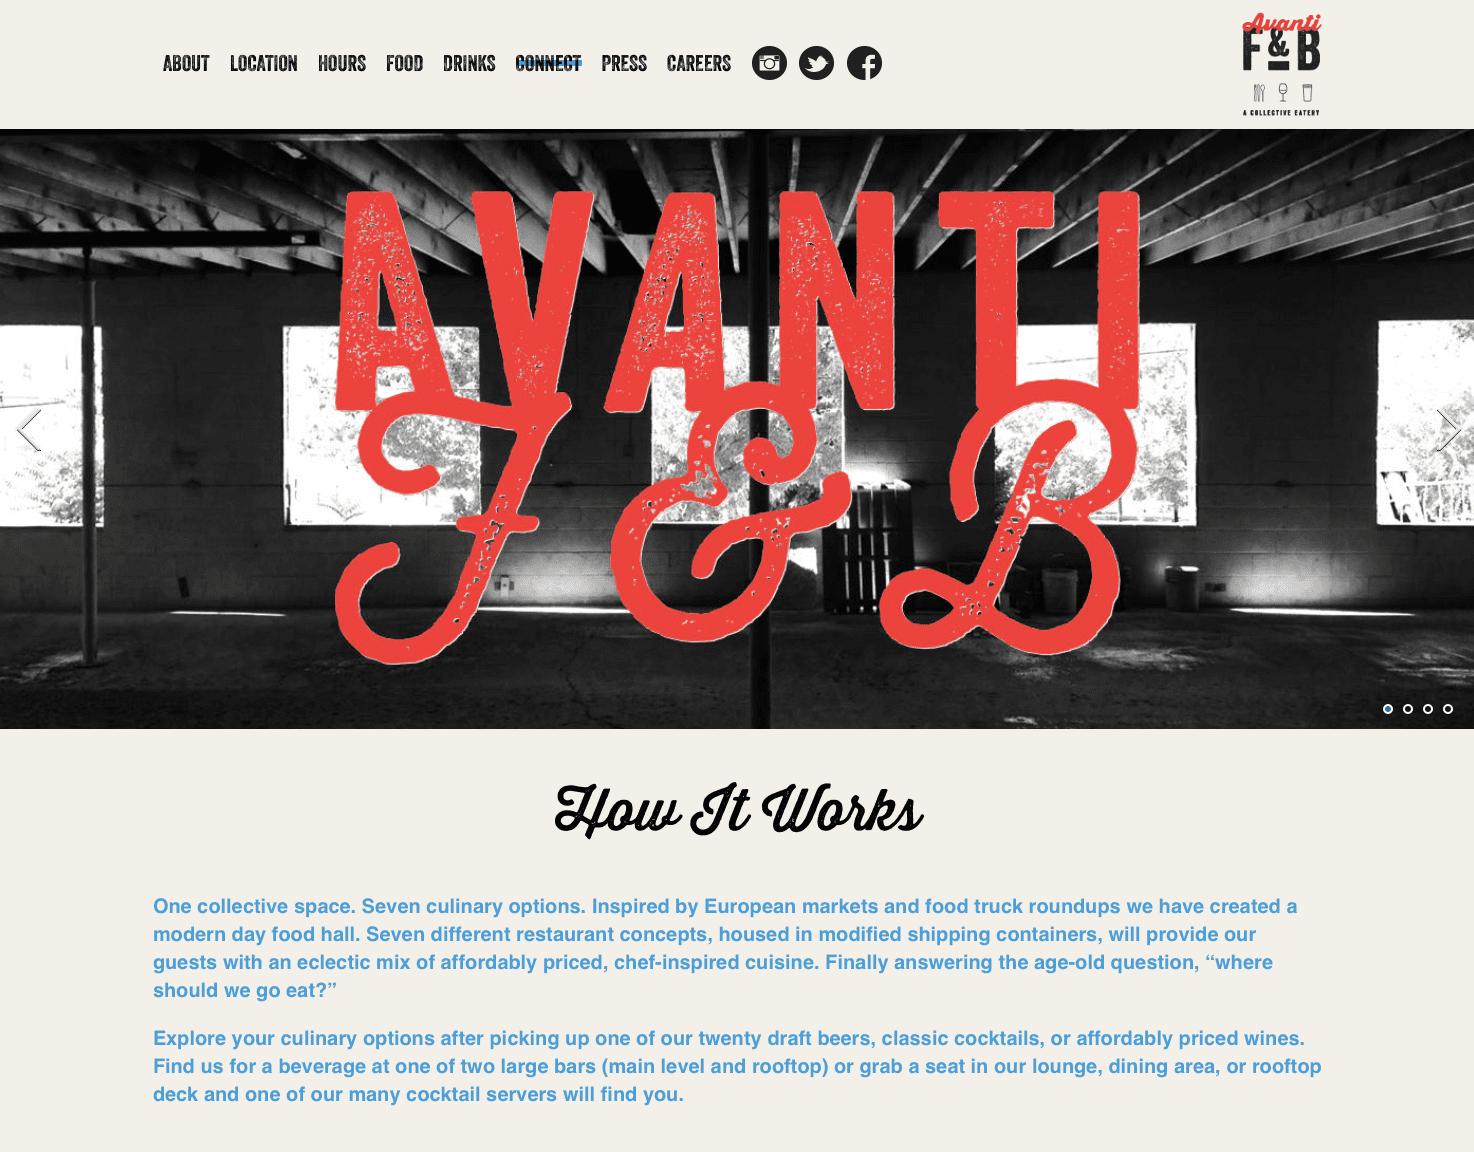 Avanti-website-old-1